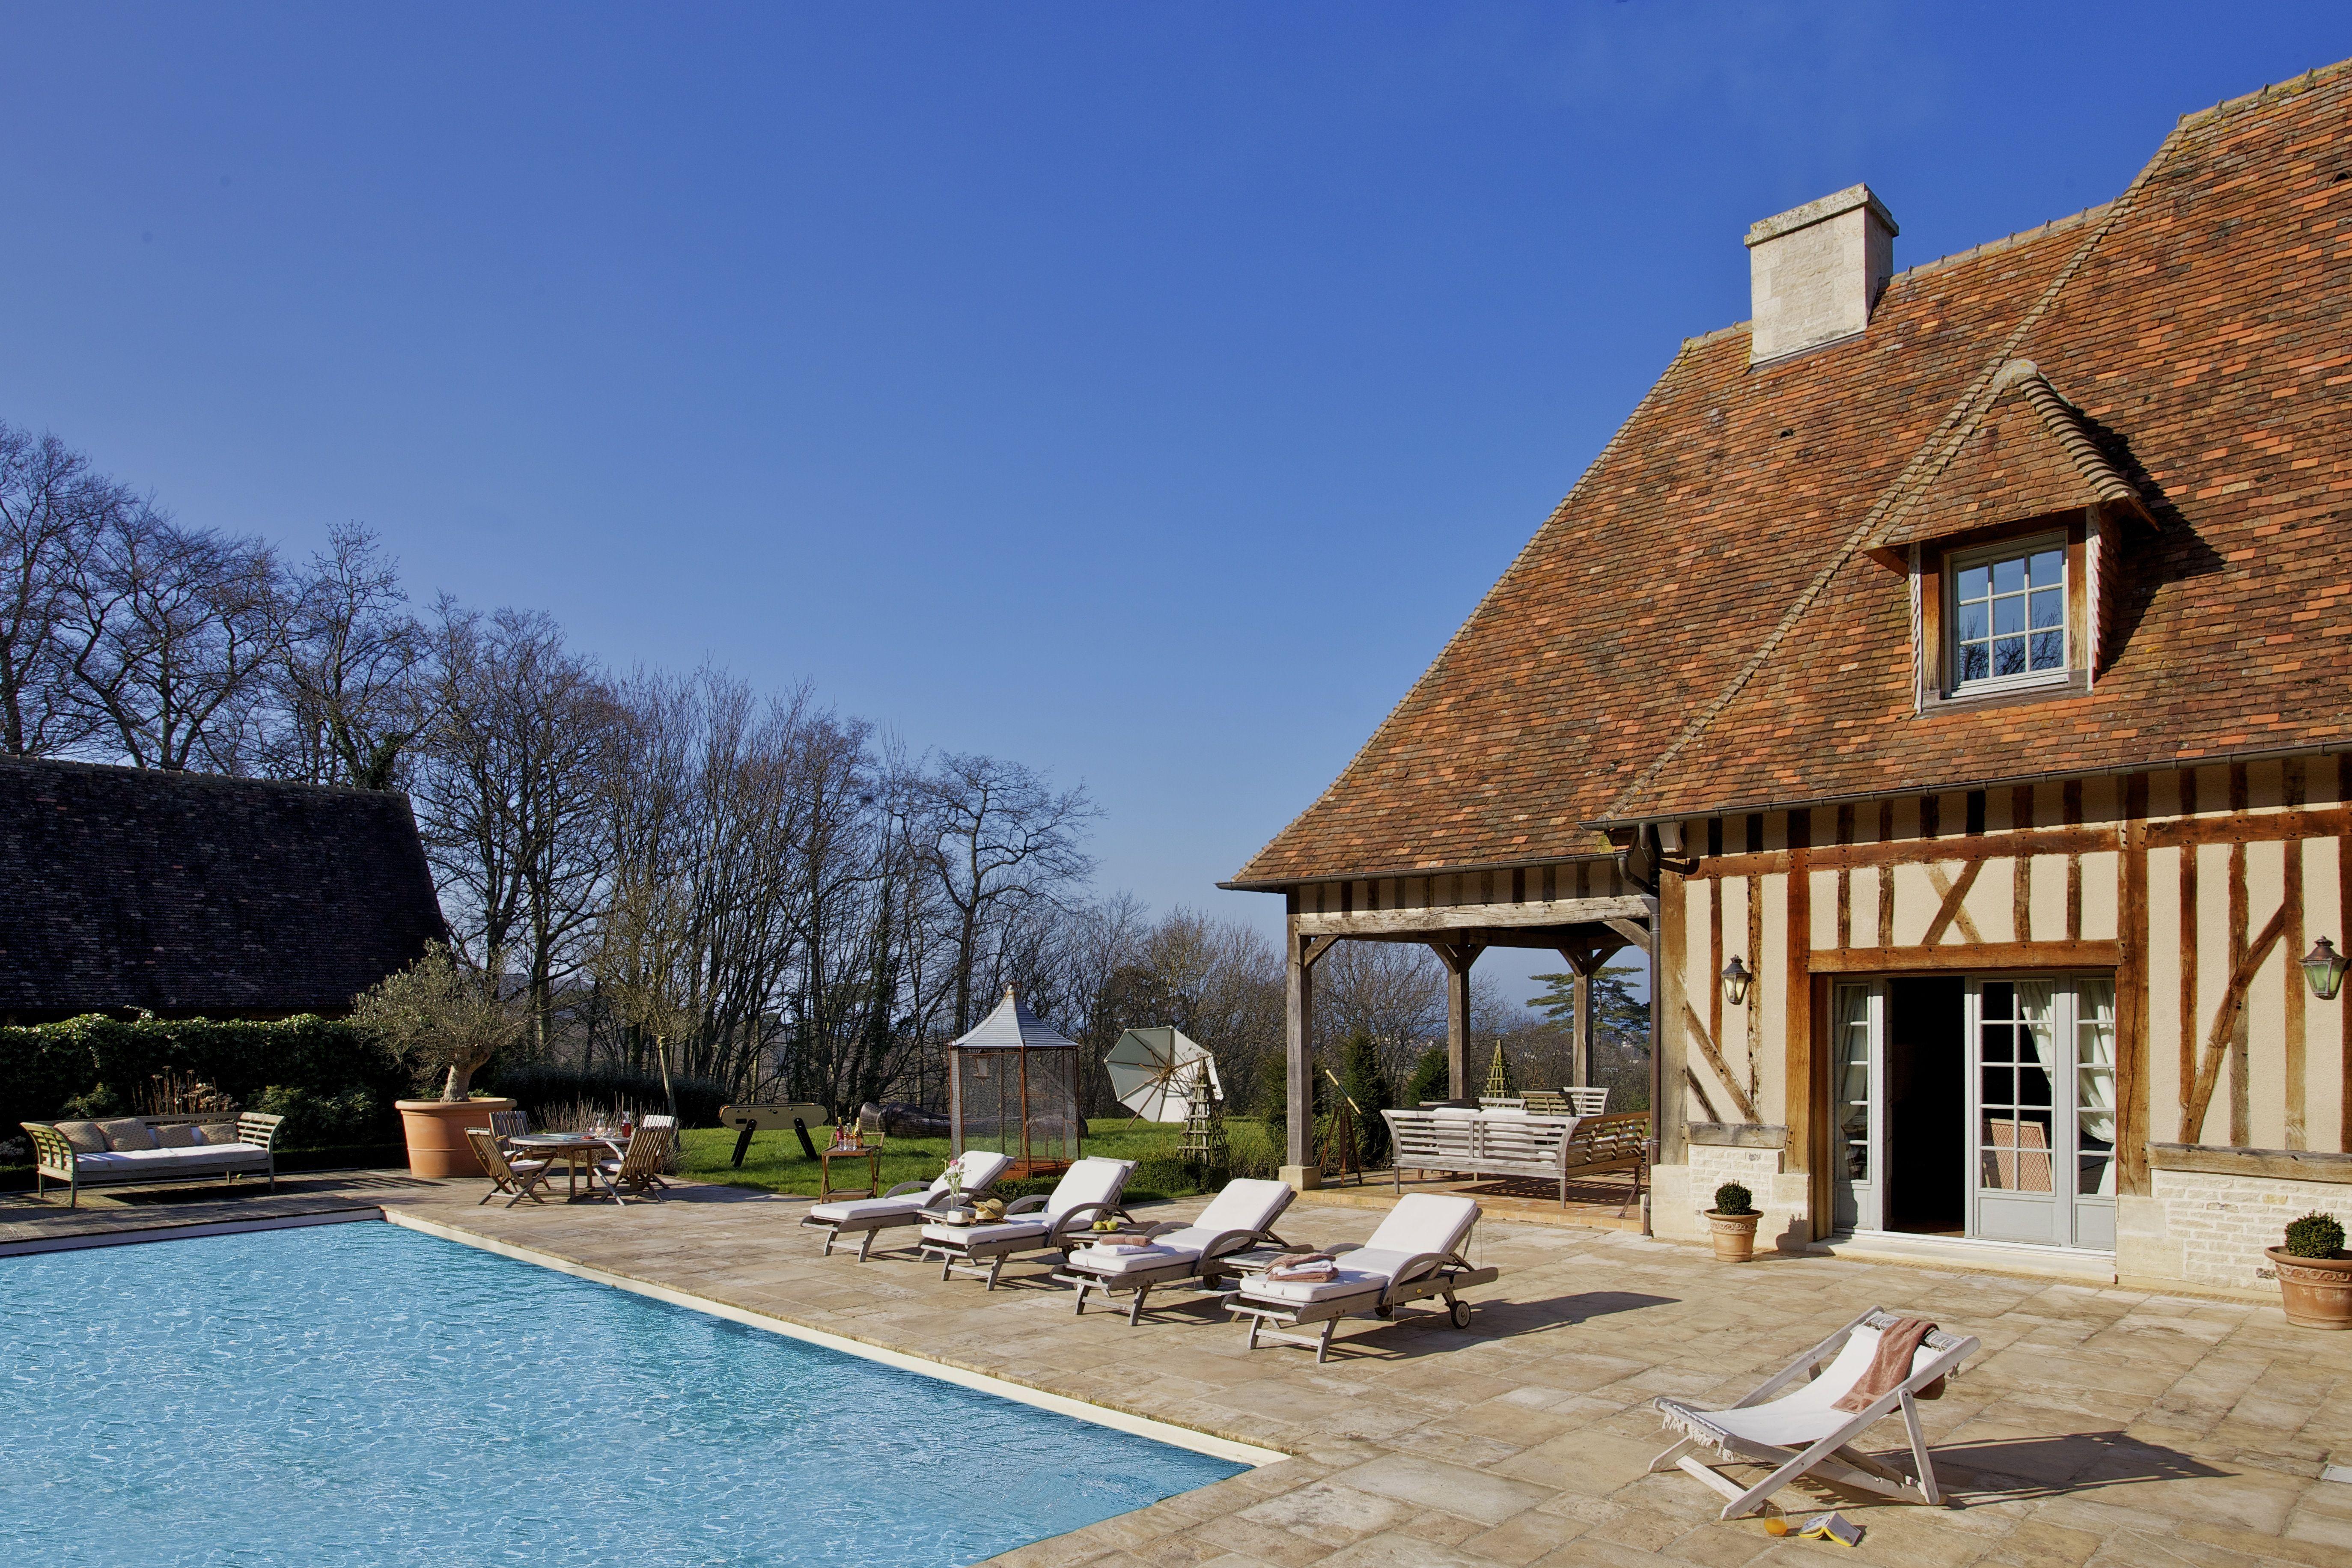 More On Http://www.lecollectionist.com/en/Luxury Villa Rental/Rent Luxury  Normandy Villas Deauville/deauville #leCollectionist #Deauville  #LuxuryHouse ...